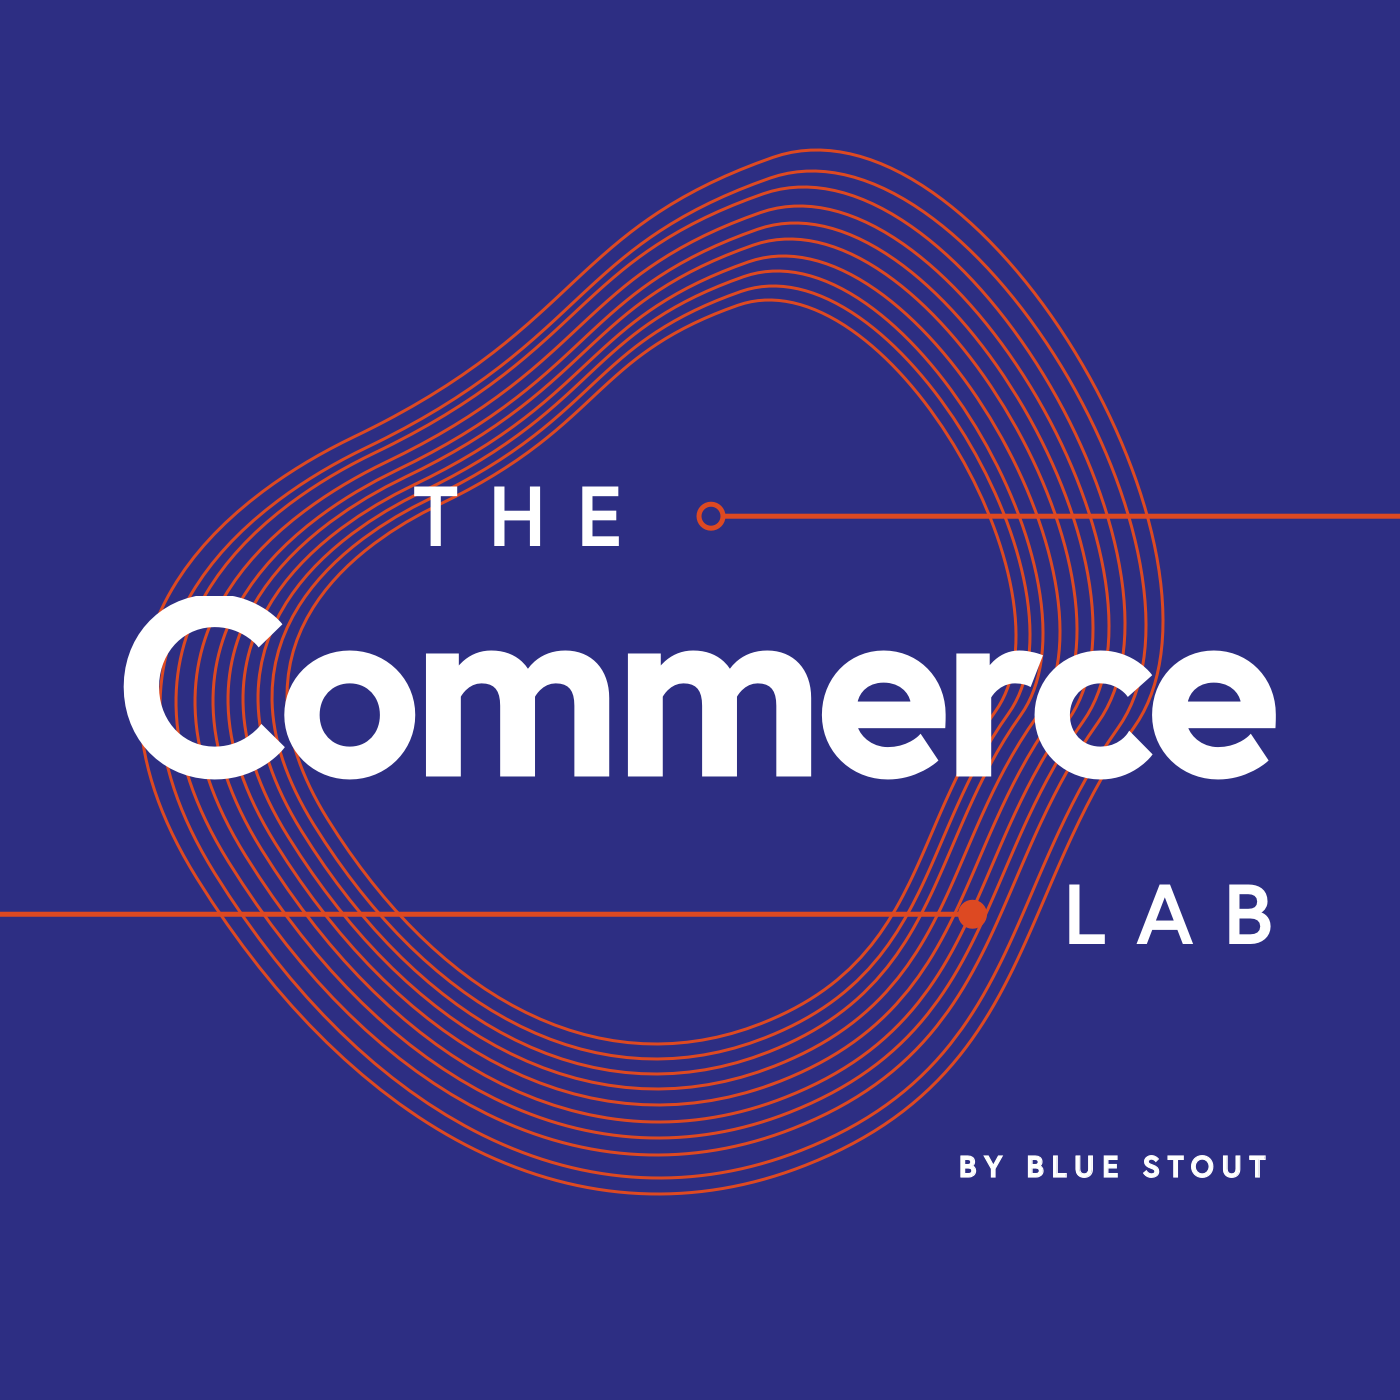 The Commerce Lab show art